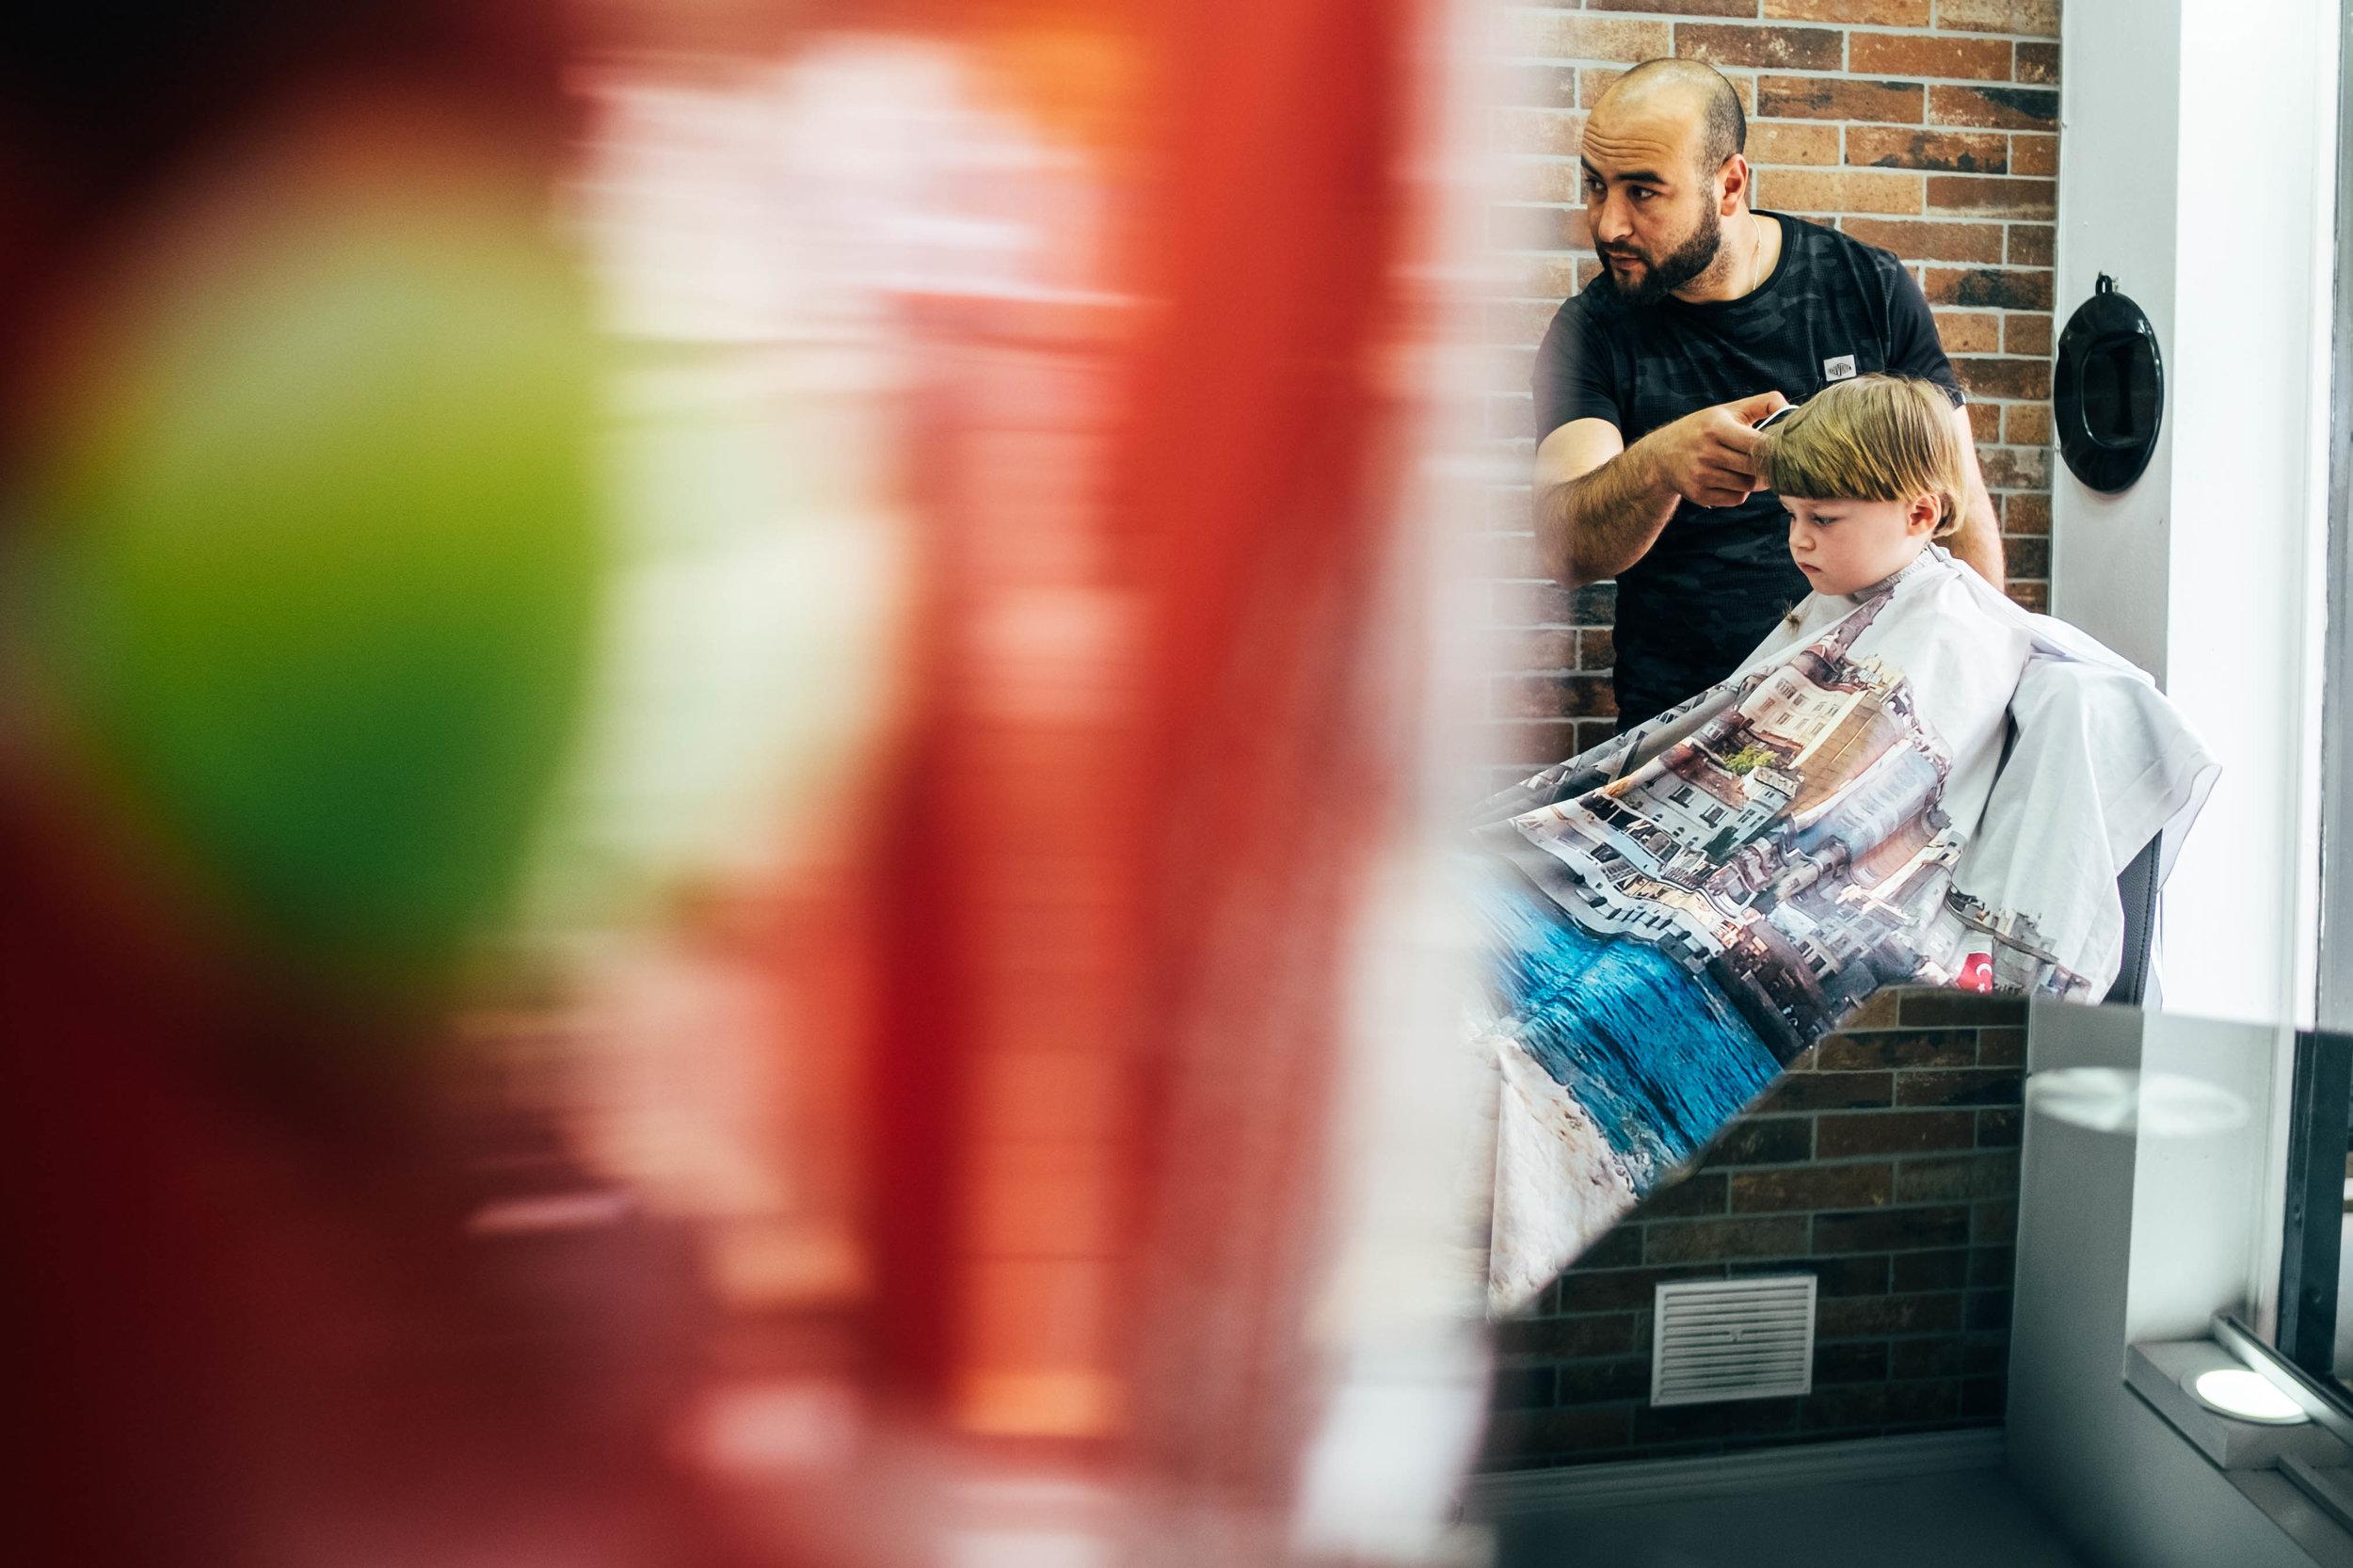 Little boy has haircut Essex Family and Wedding Documentary Photographer